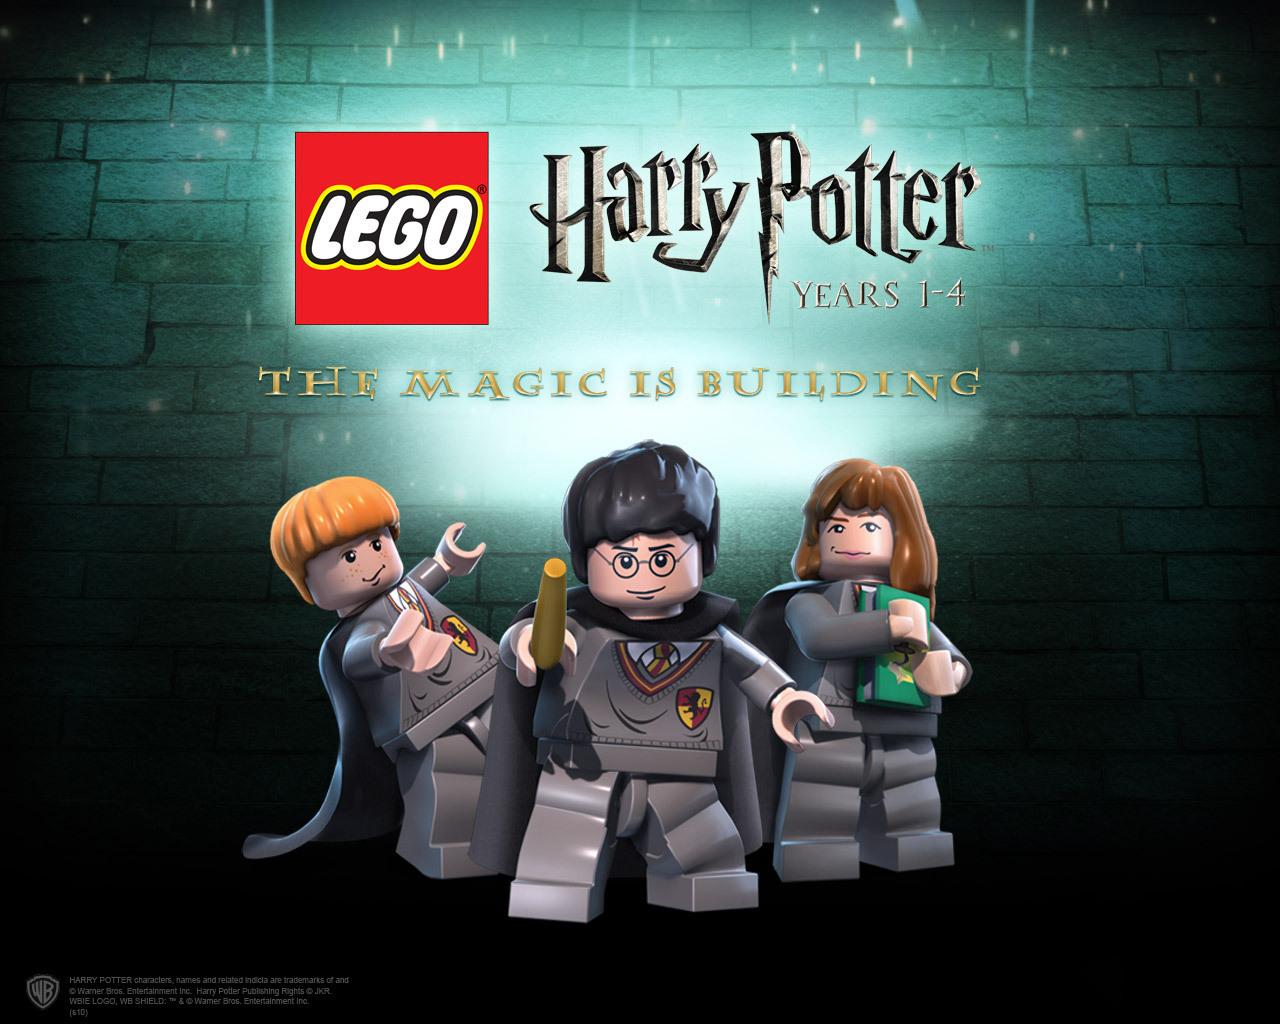 Lego Harry Potter Wallpaper 2